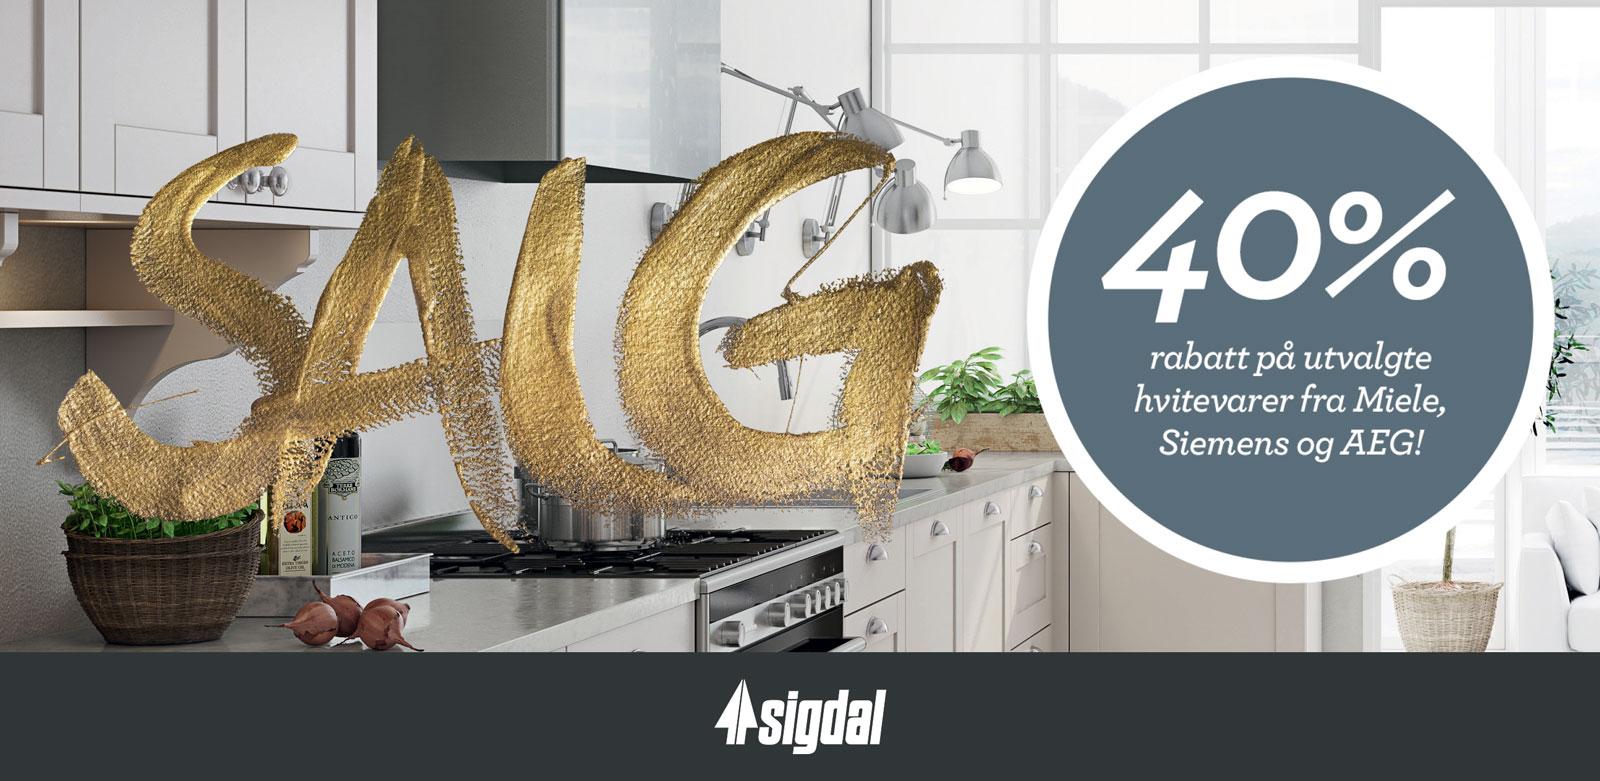 Salgs plakat for Sigdal